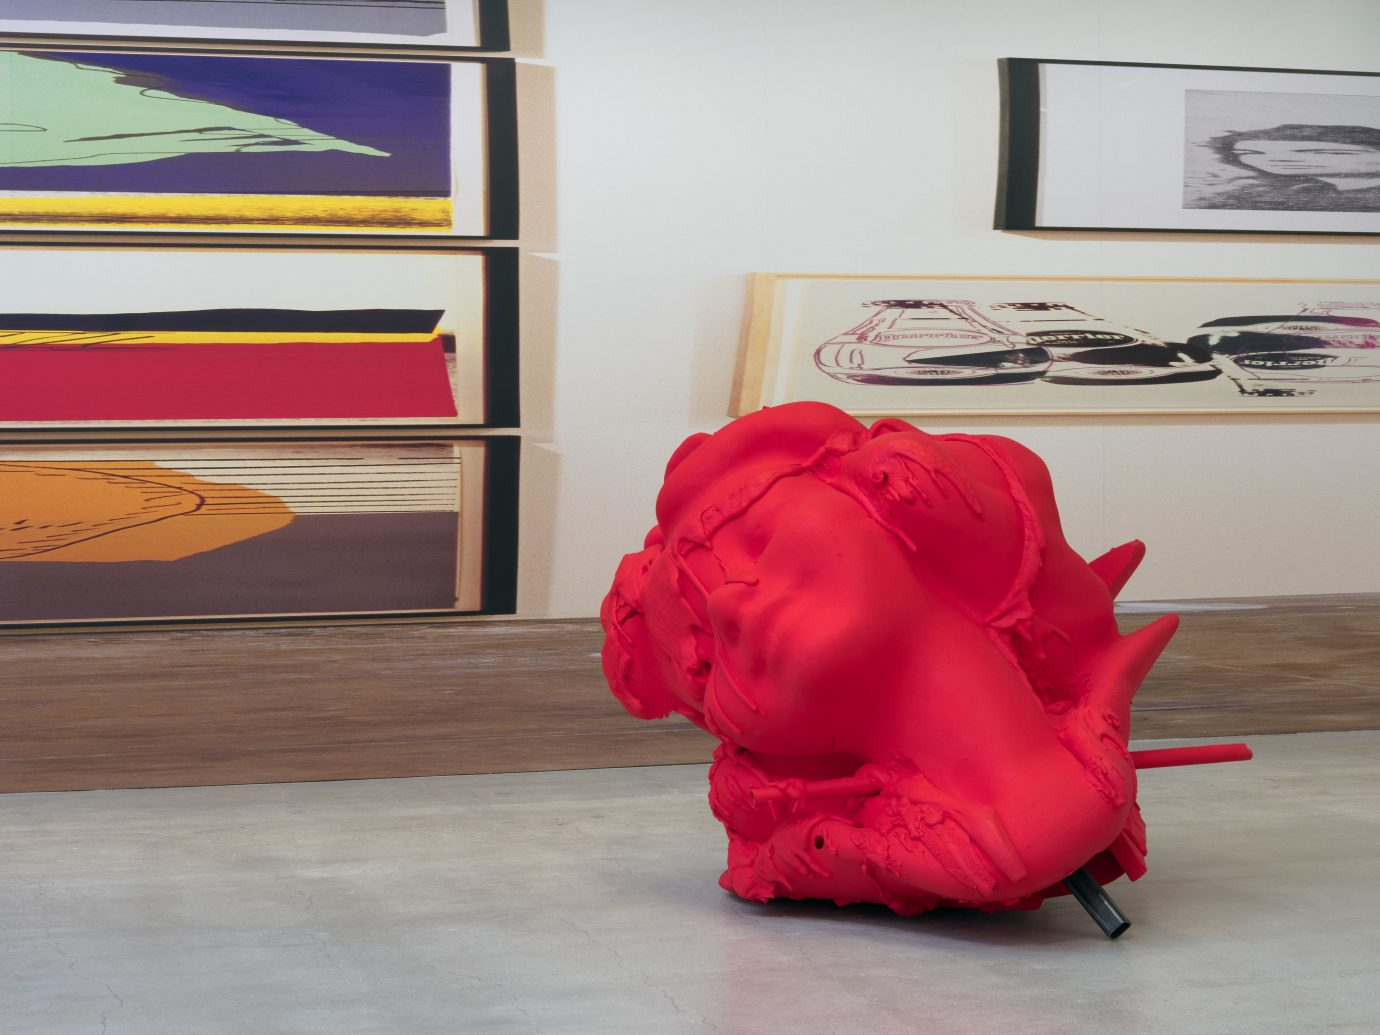 Arts + Culture Hotels Jetsetter Guides shopping Travel Trends Trip Ideas indoor red pink textile flooring furniture Design art floor table modern art interior design